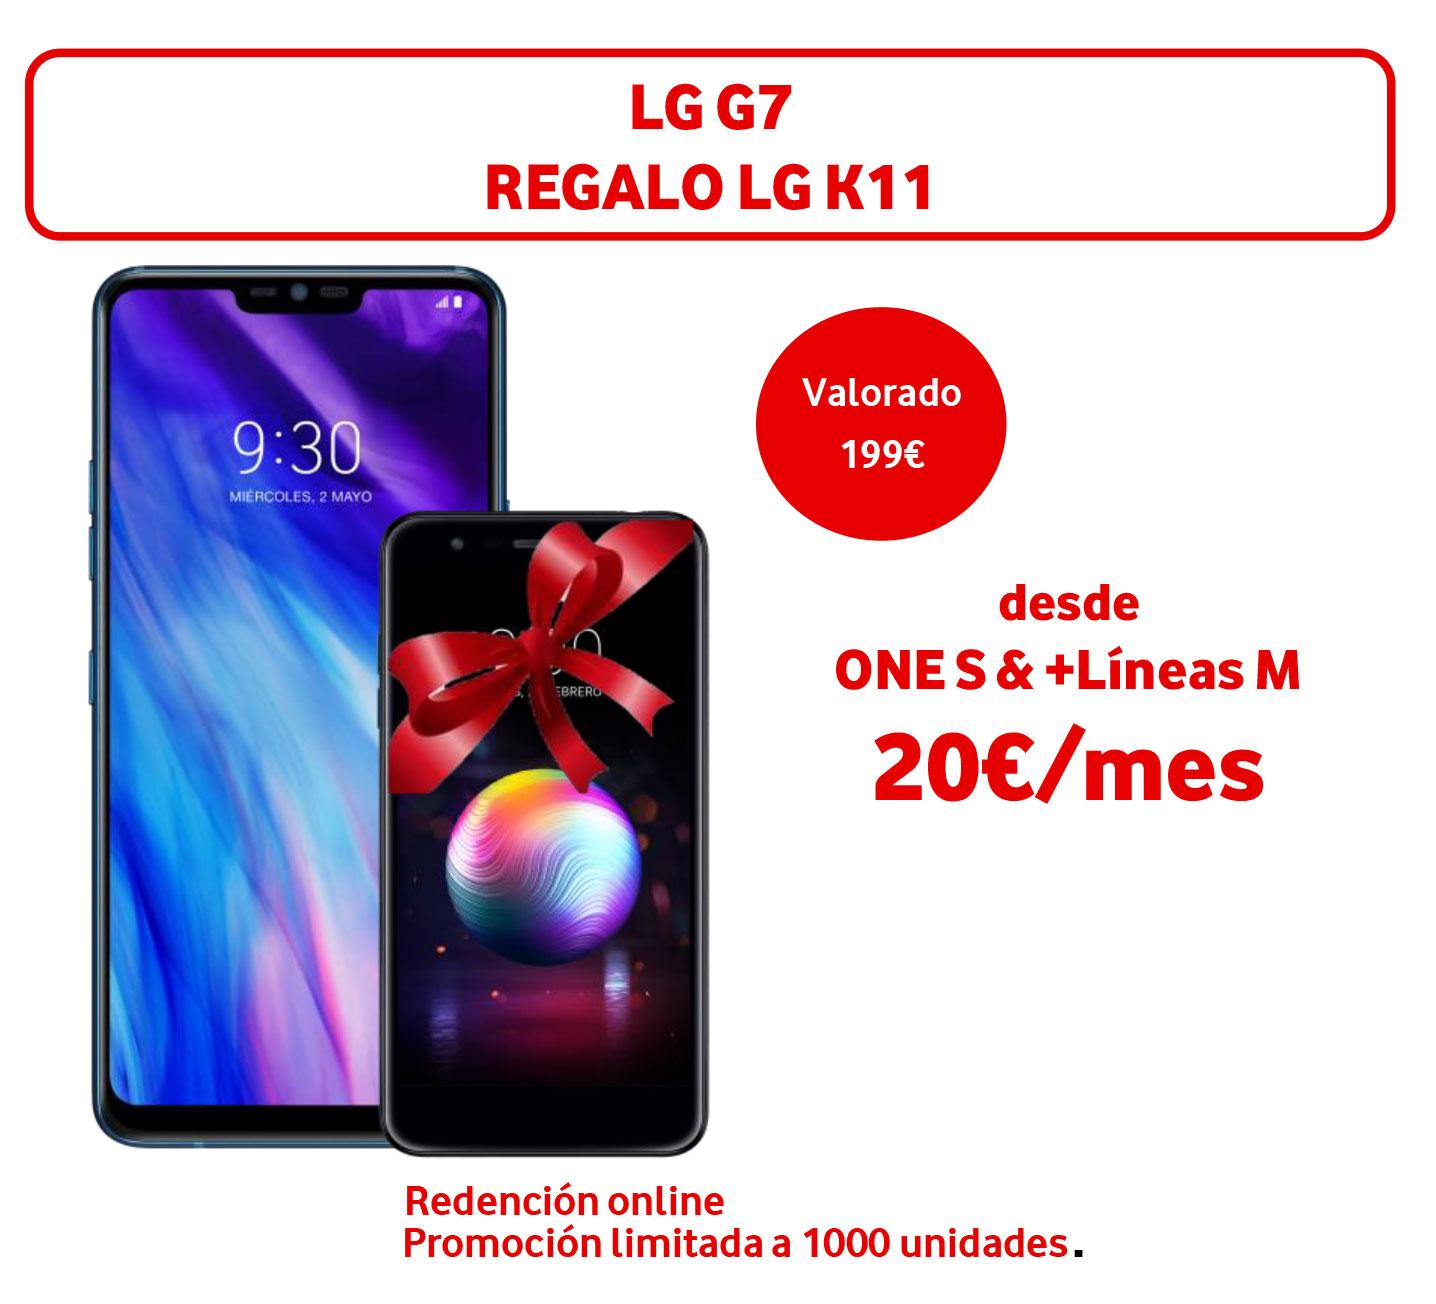 Bonatel_Campana-Navidad-2018-2019_LG G7